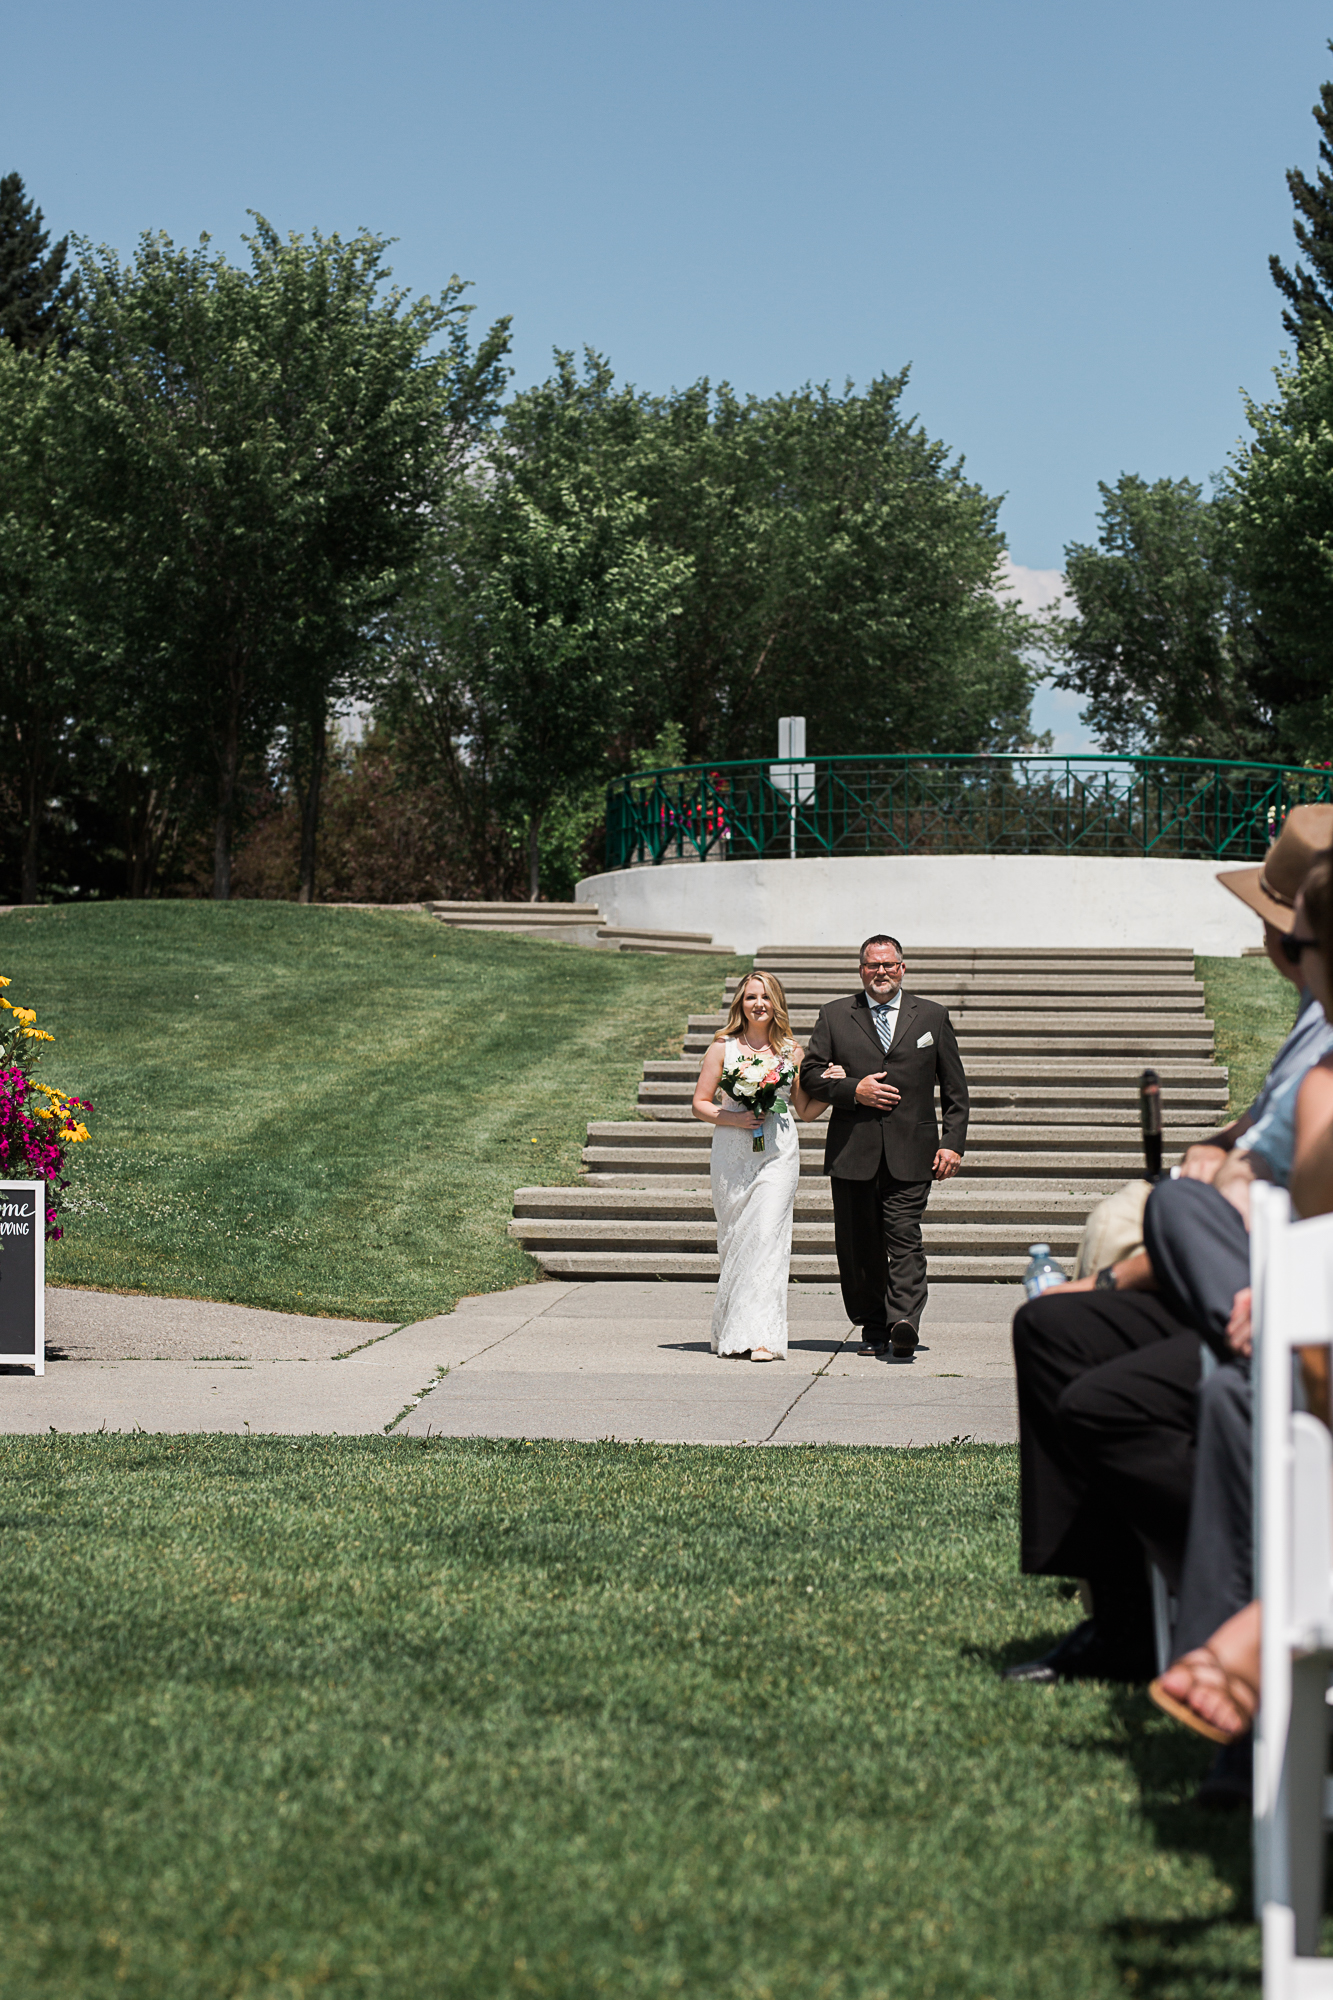 Baker-park-wedding-AC-28.jpg